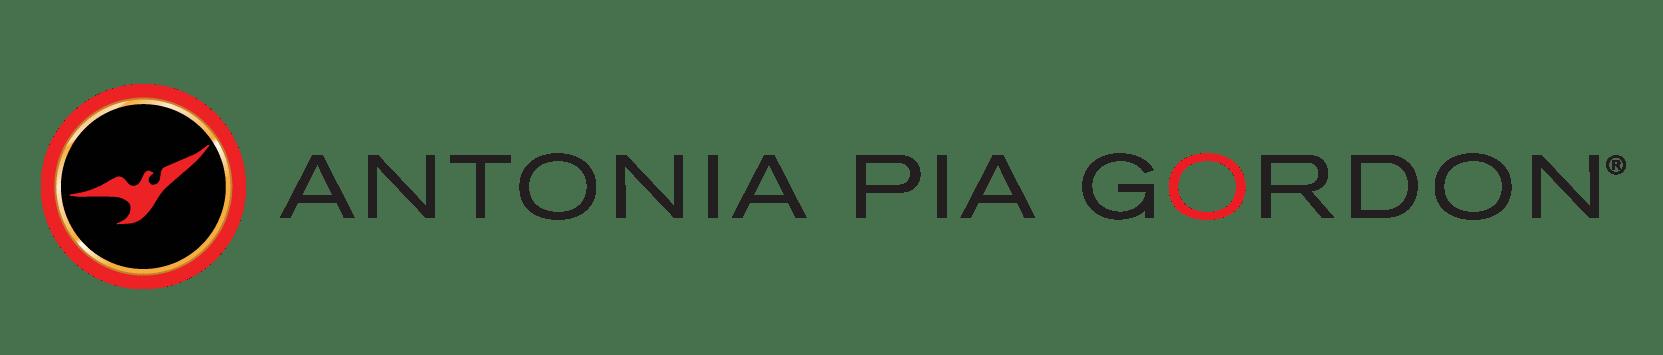 ANTONIA PIA GORDON company logo